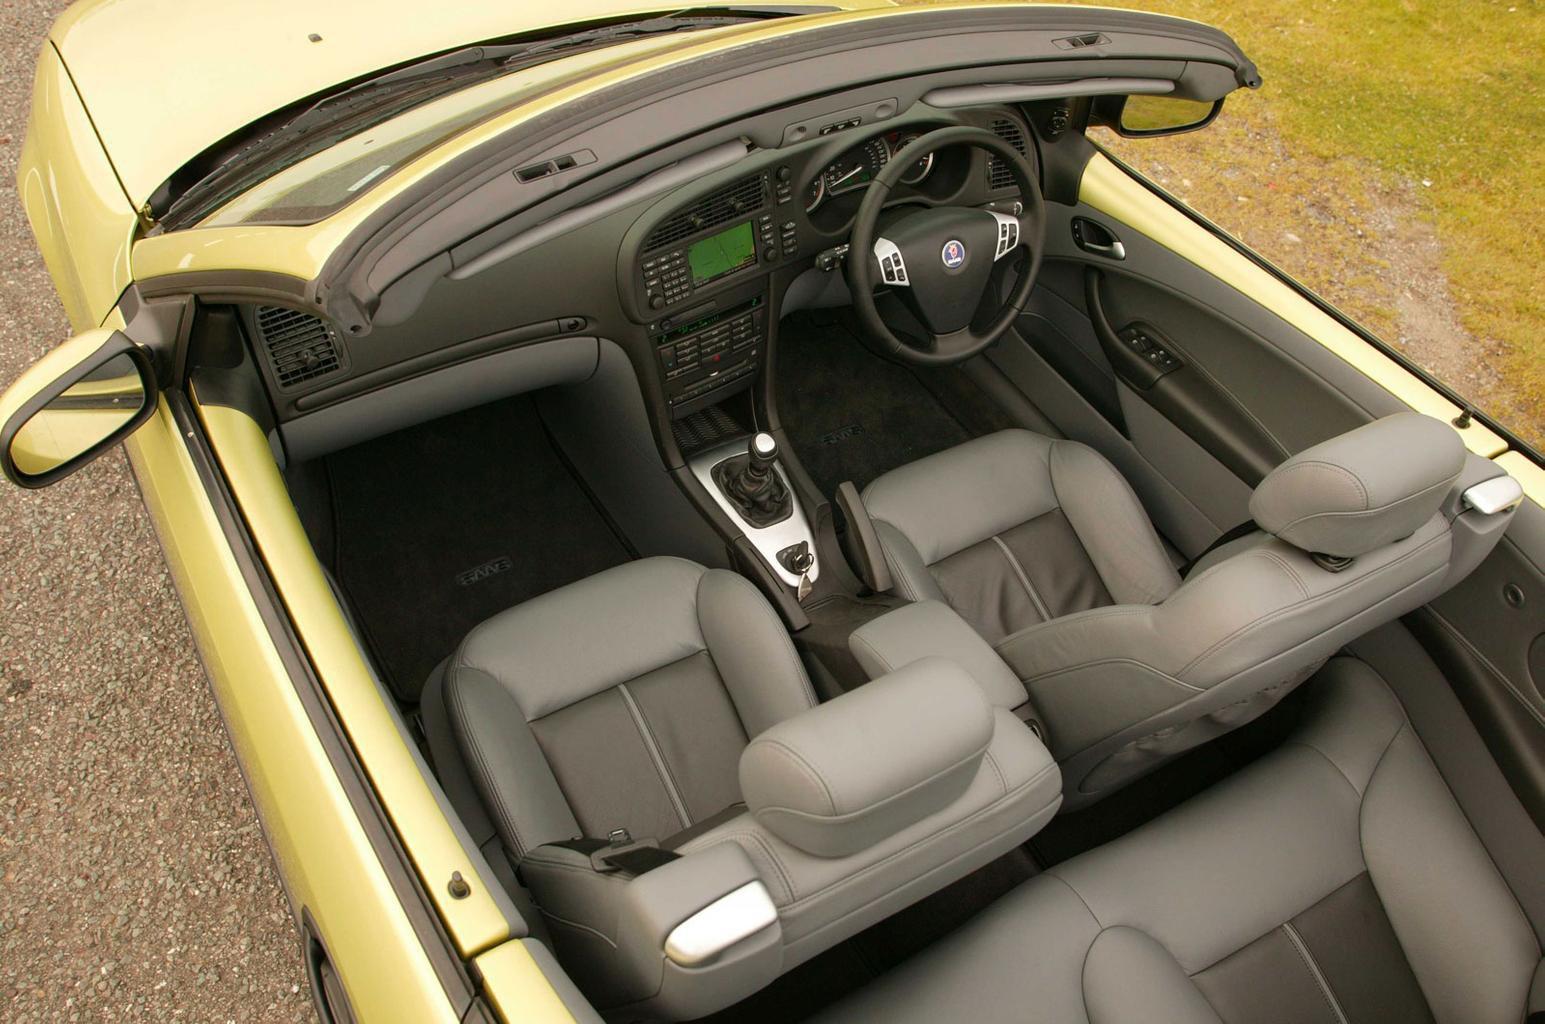 Saab 9-3 Cabriolet interior